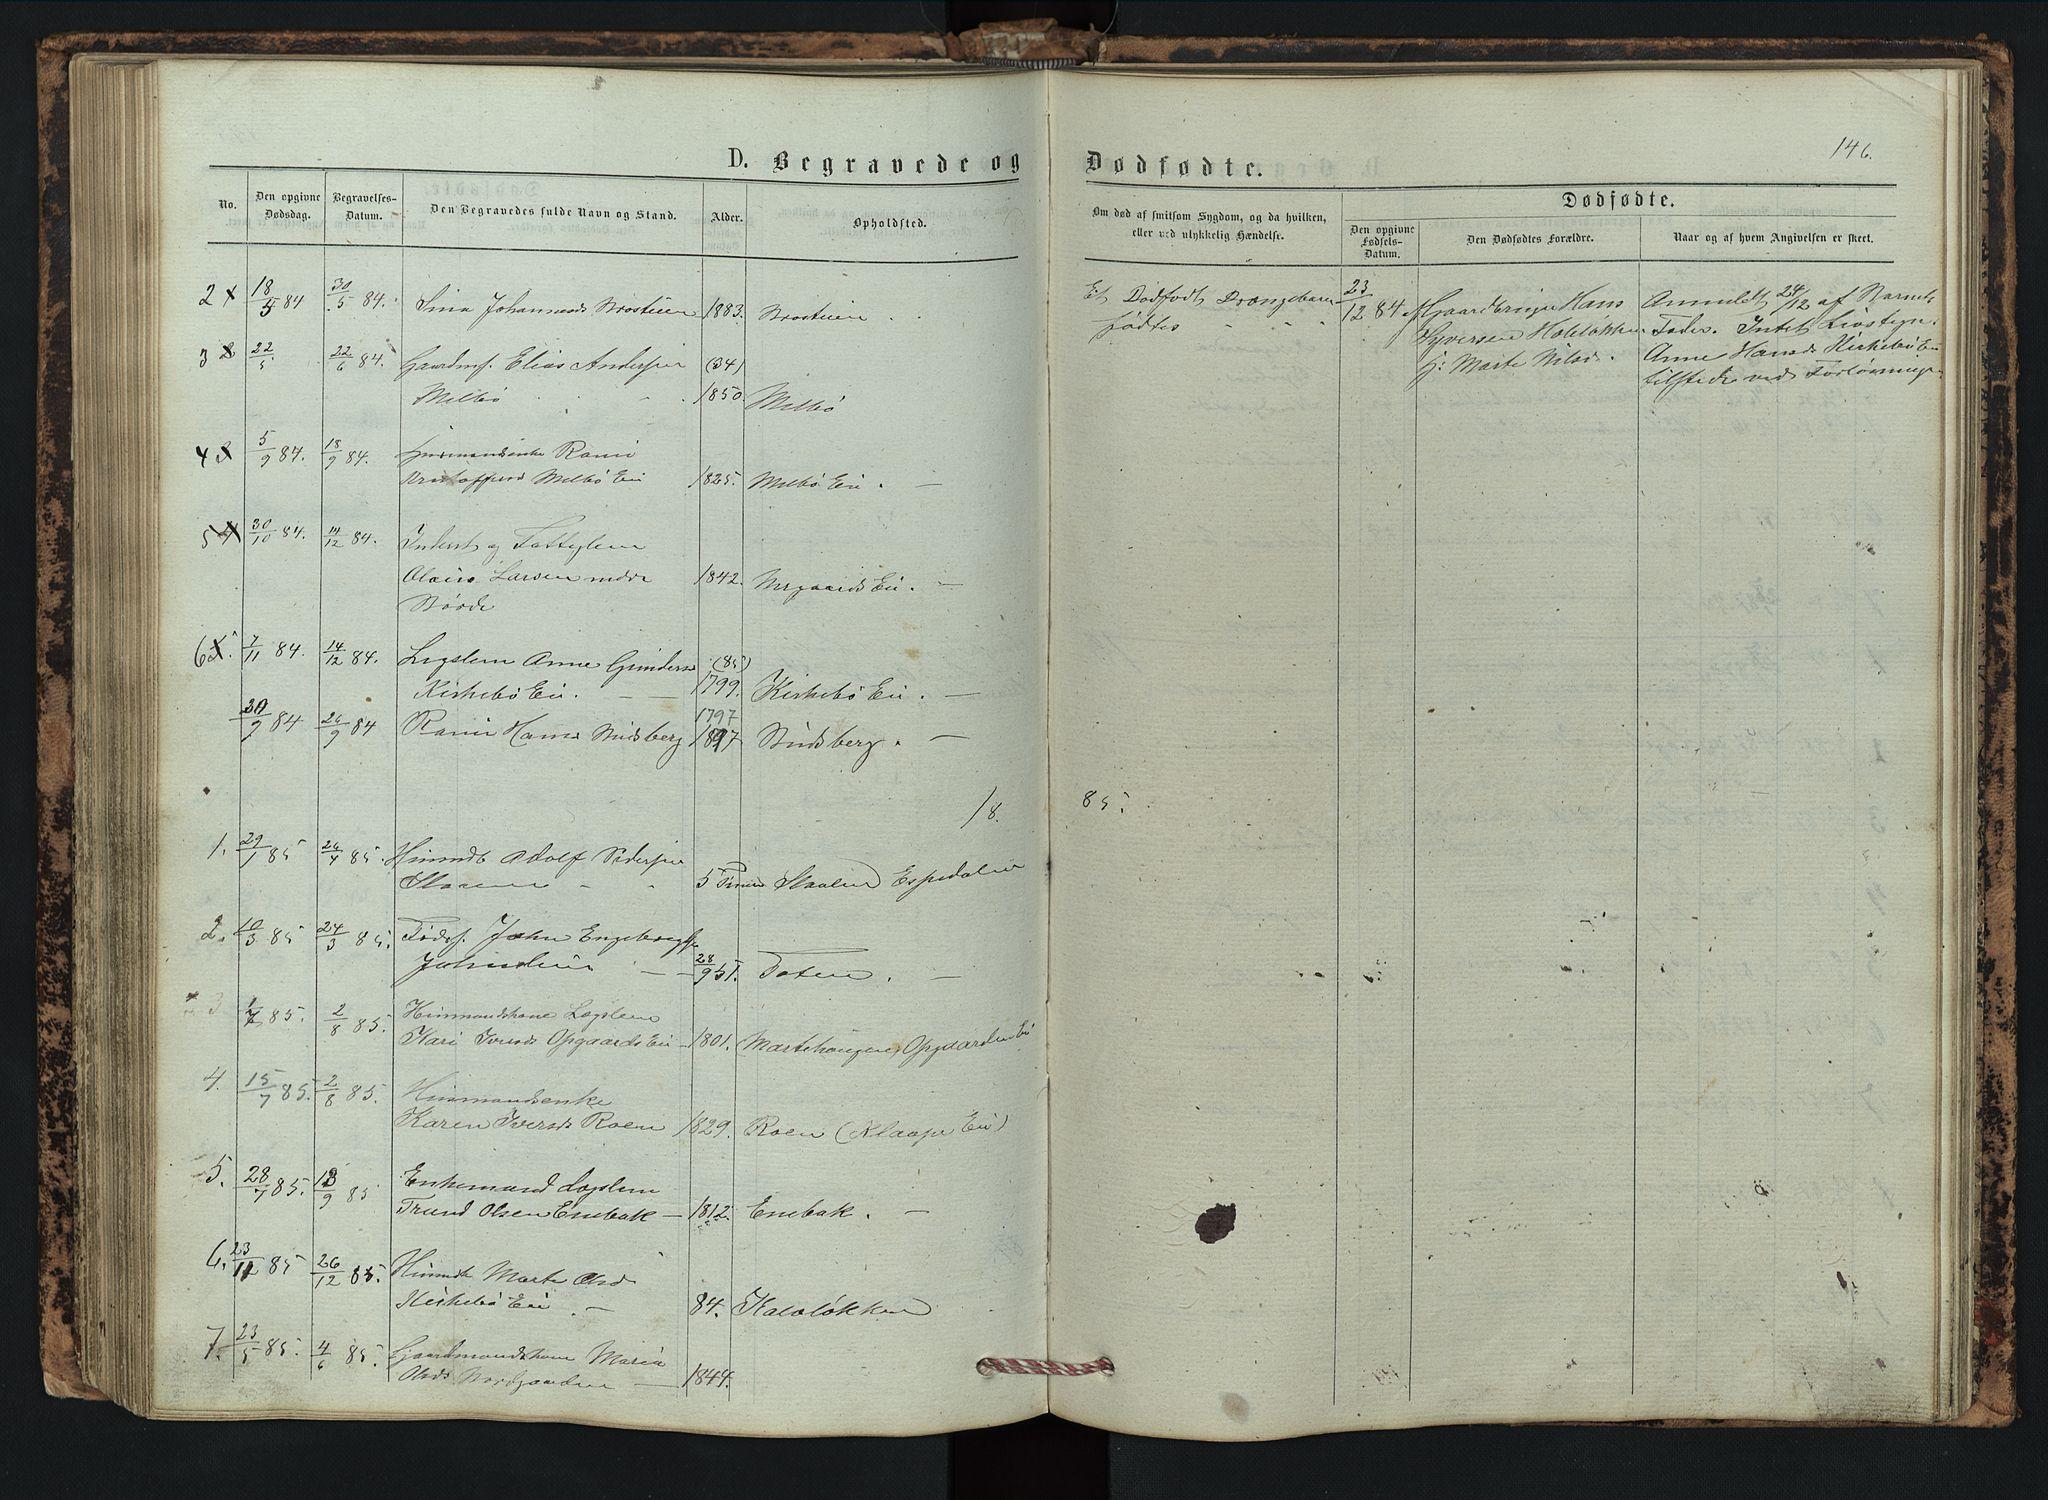 SAH, Vestre Gausdal prestekontor, Klokkerbok nr. 2, 1874-1897, s. 146